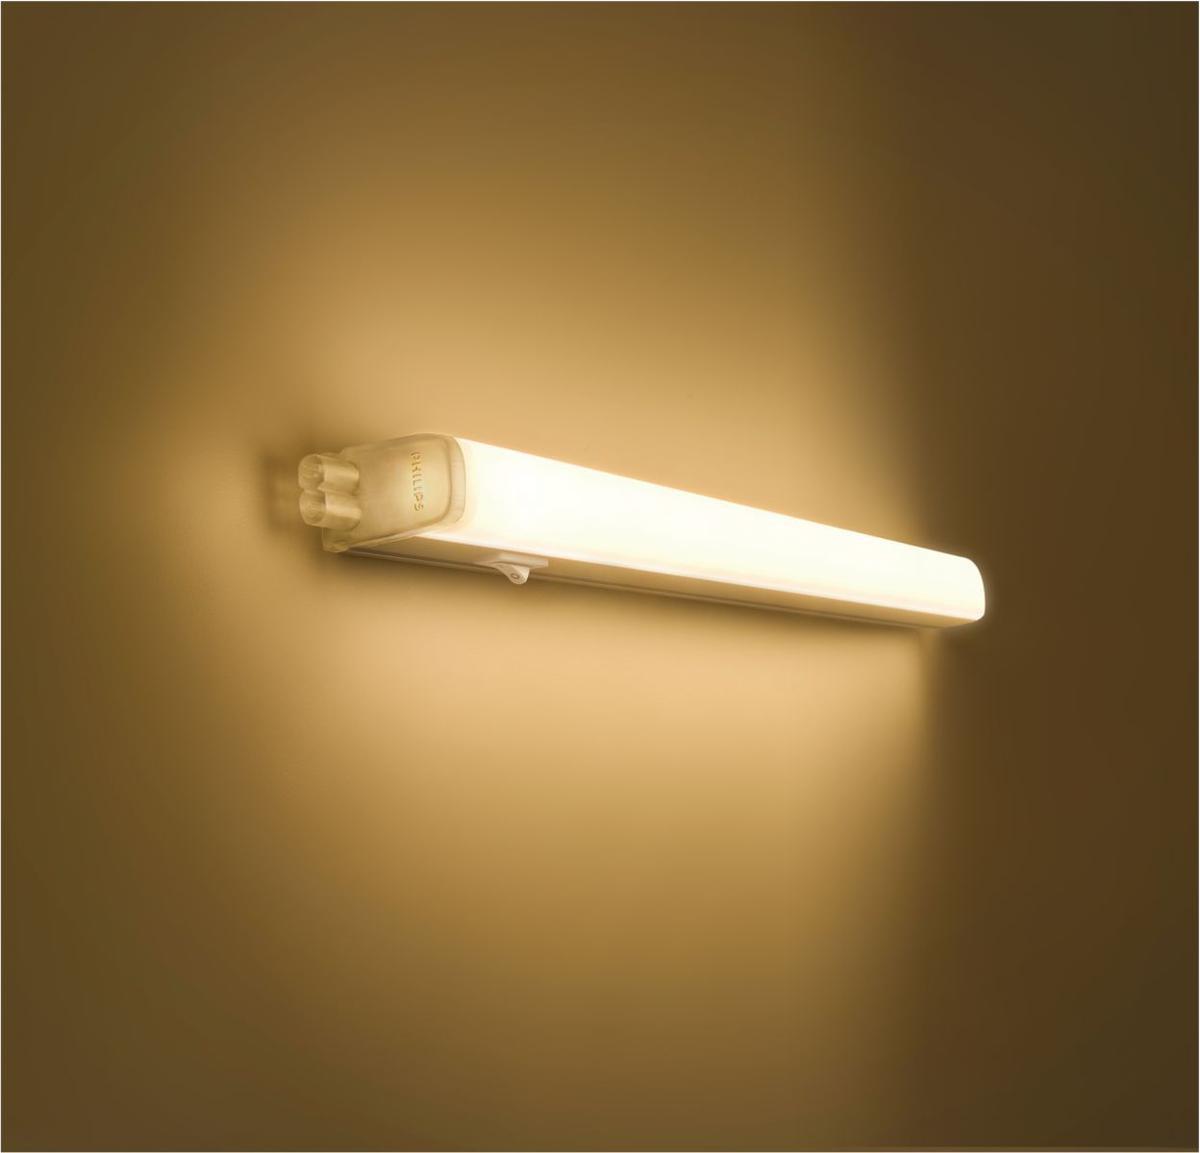 Philips LED Leuchtstoffröhre 33cm 3,2W TrunkLinea Warmweiß 31236/31/P1